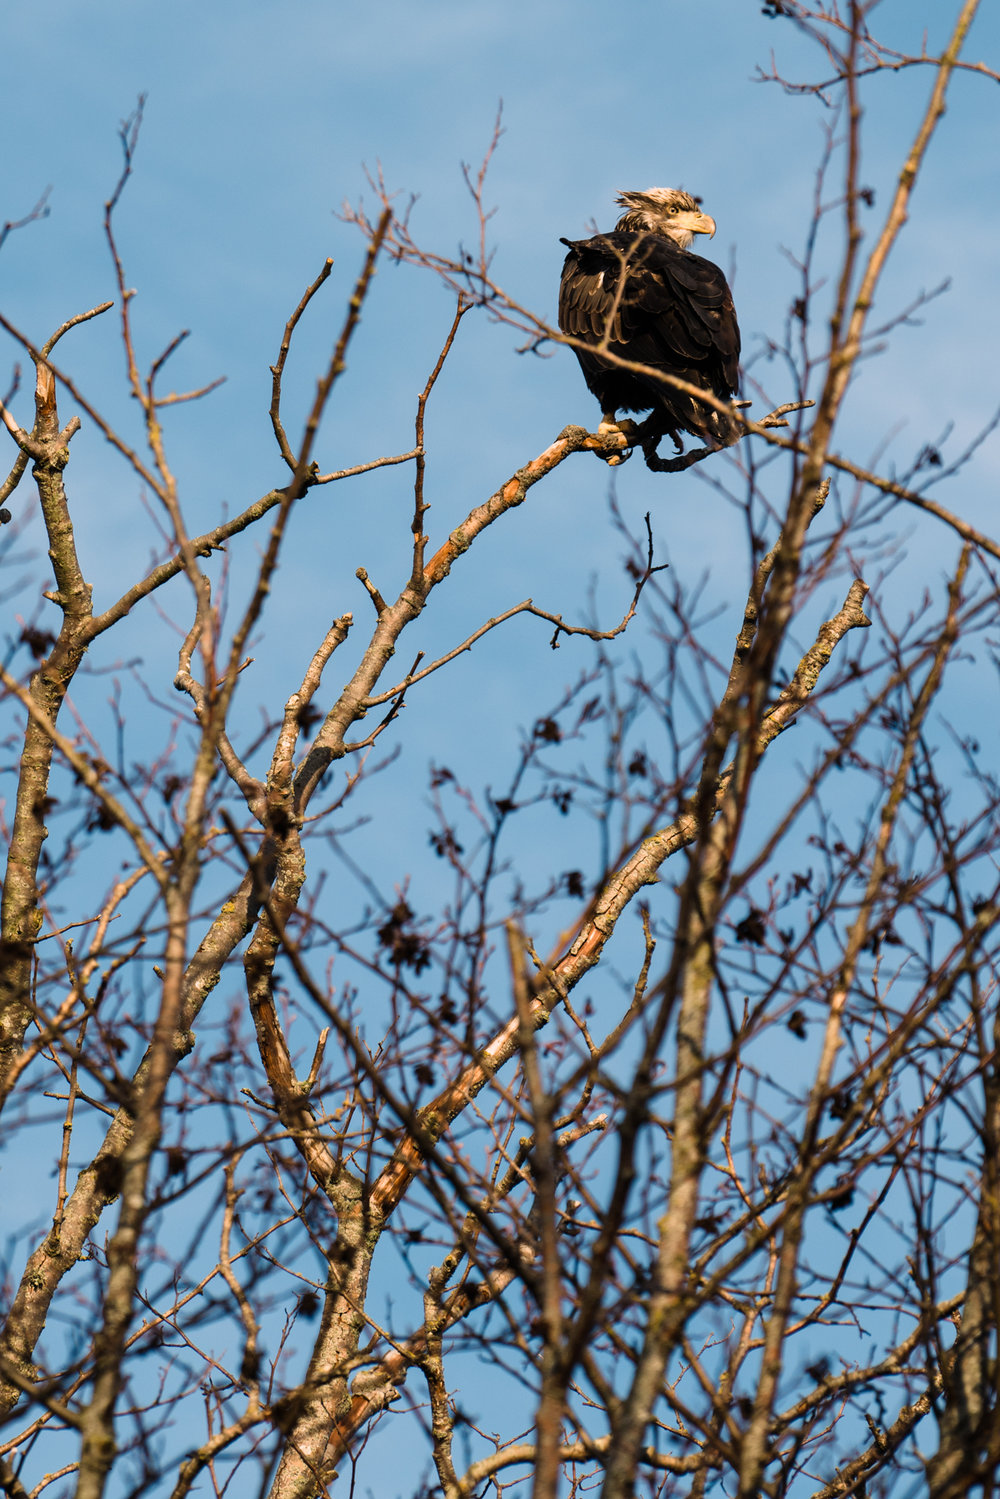 Skagit Delta Goose Chase web-03358.jpg